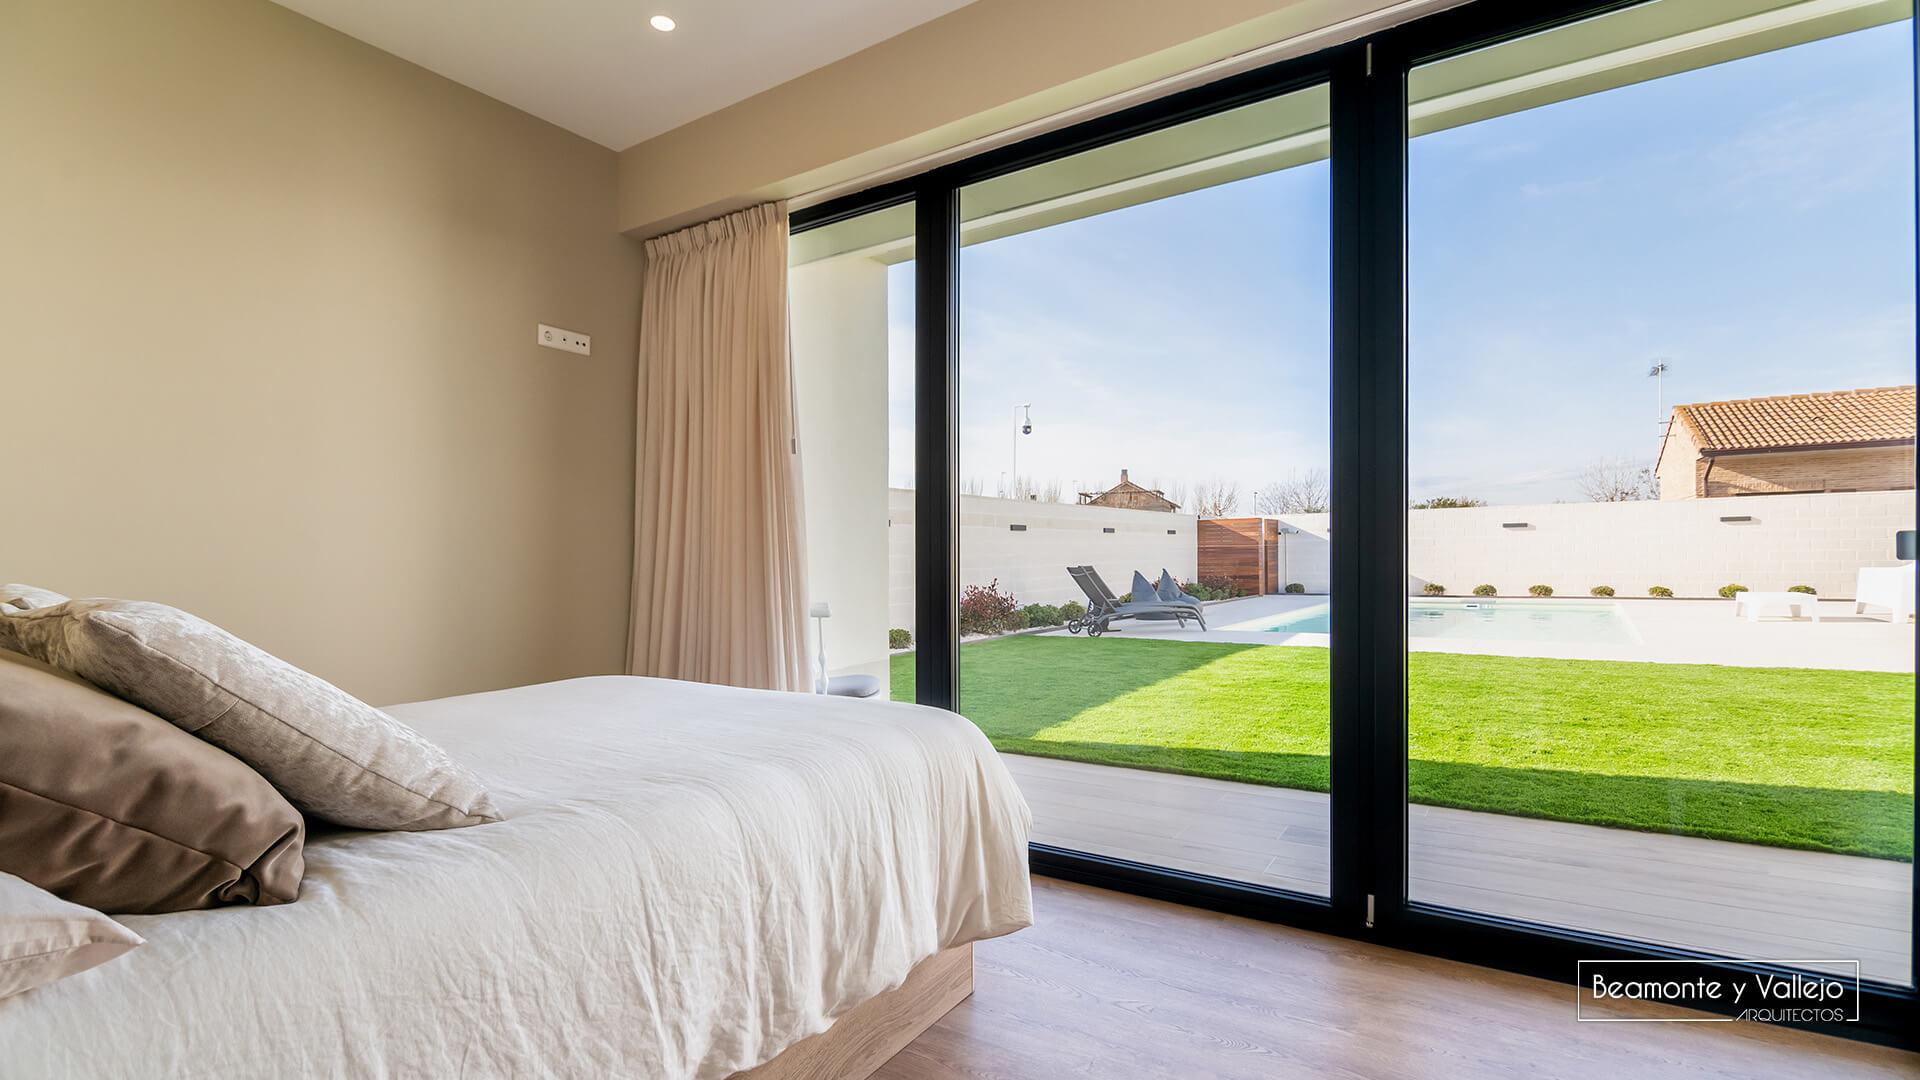 Beamonte y Vallejo arquitectos - Passivhaus Utebo - 18